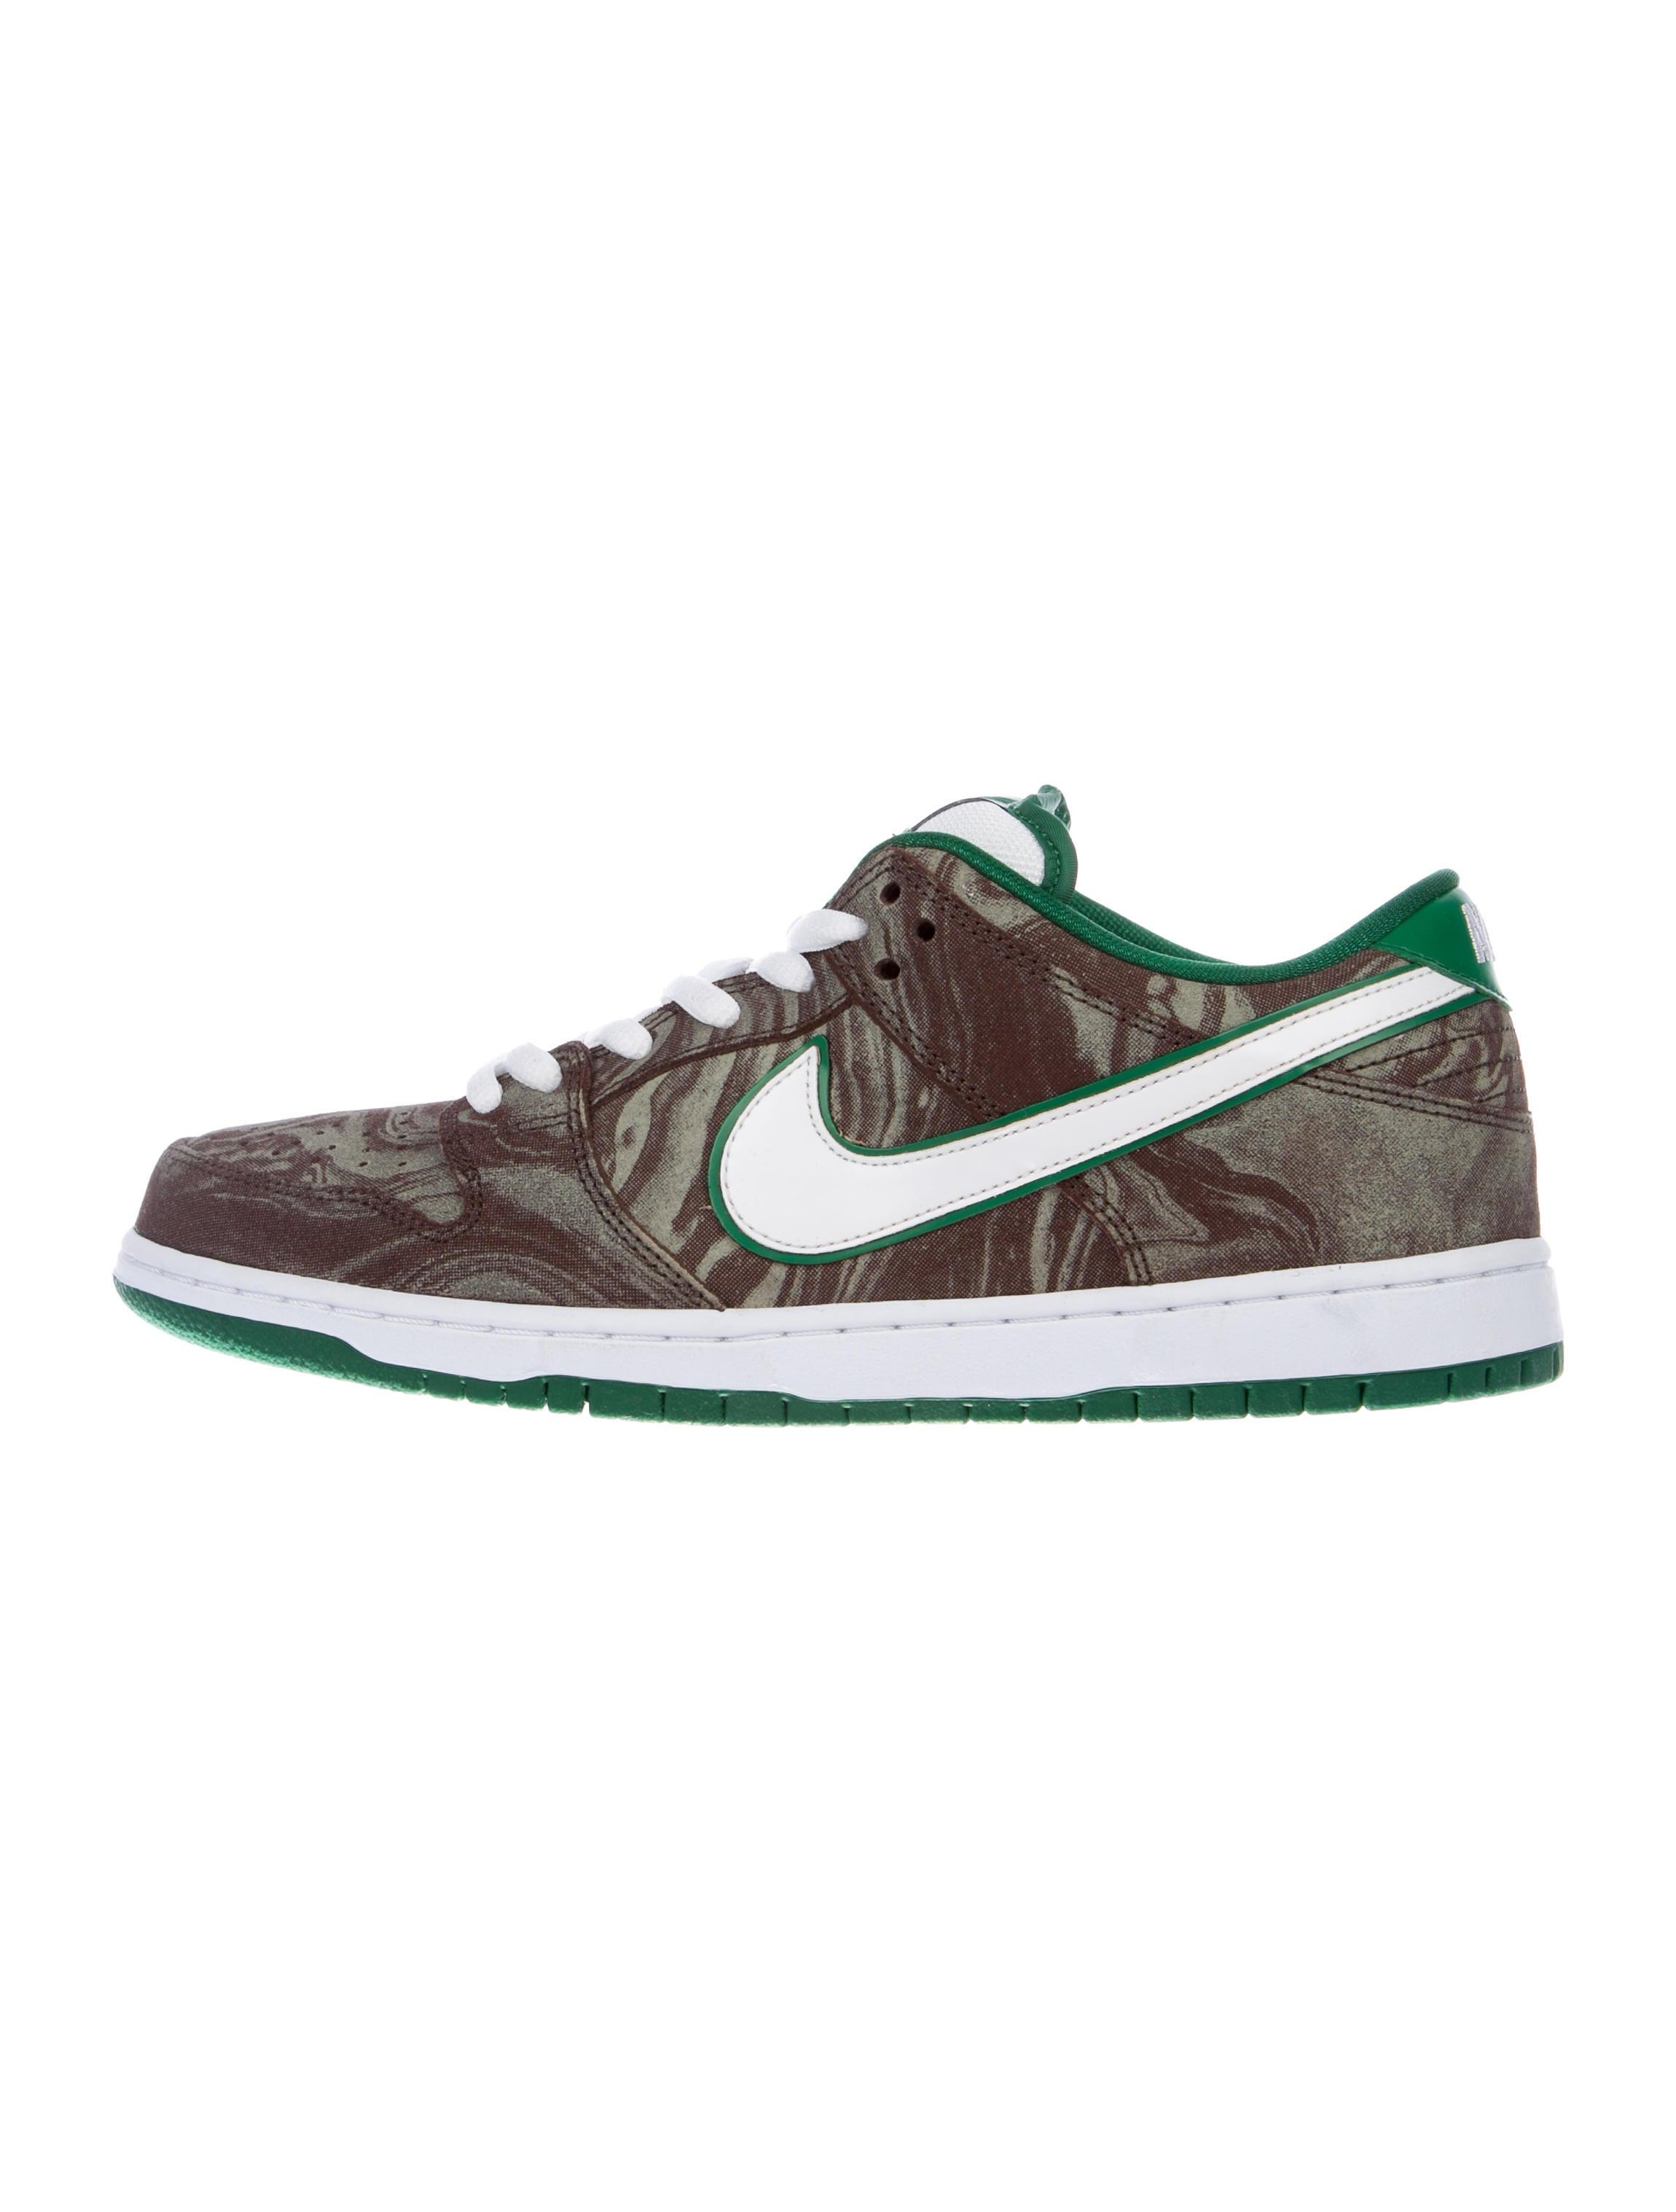 half off 0d7fd 8481a Nike SB Dunk Low PRM Starbucks Sneakers - Shoes - WU223825 ...